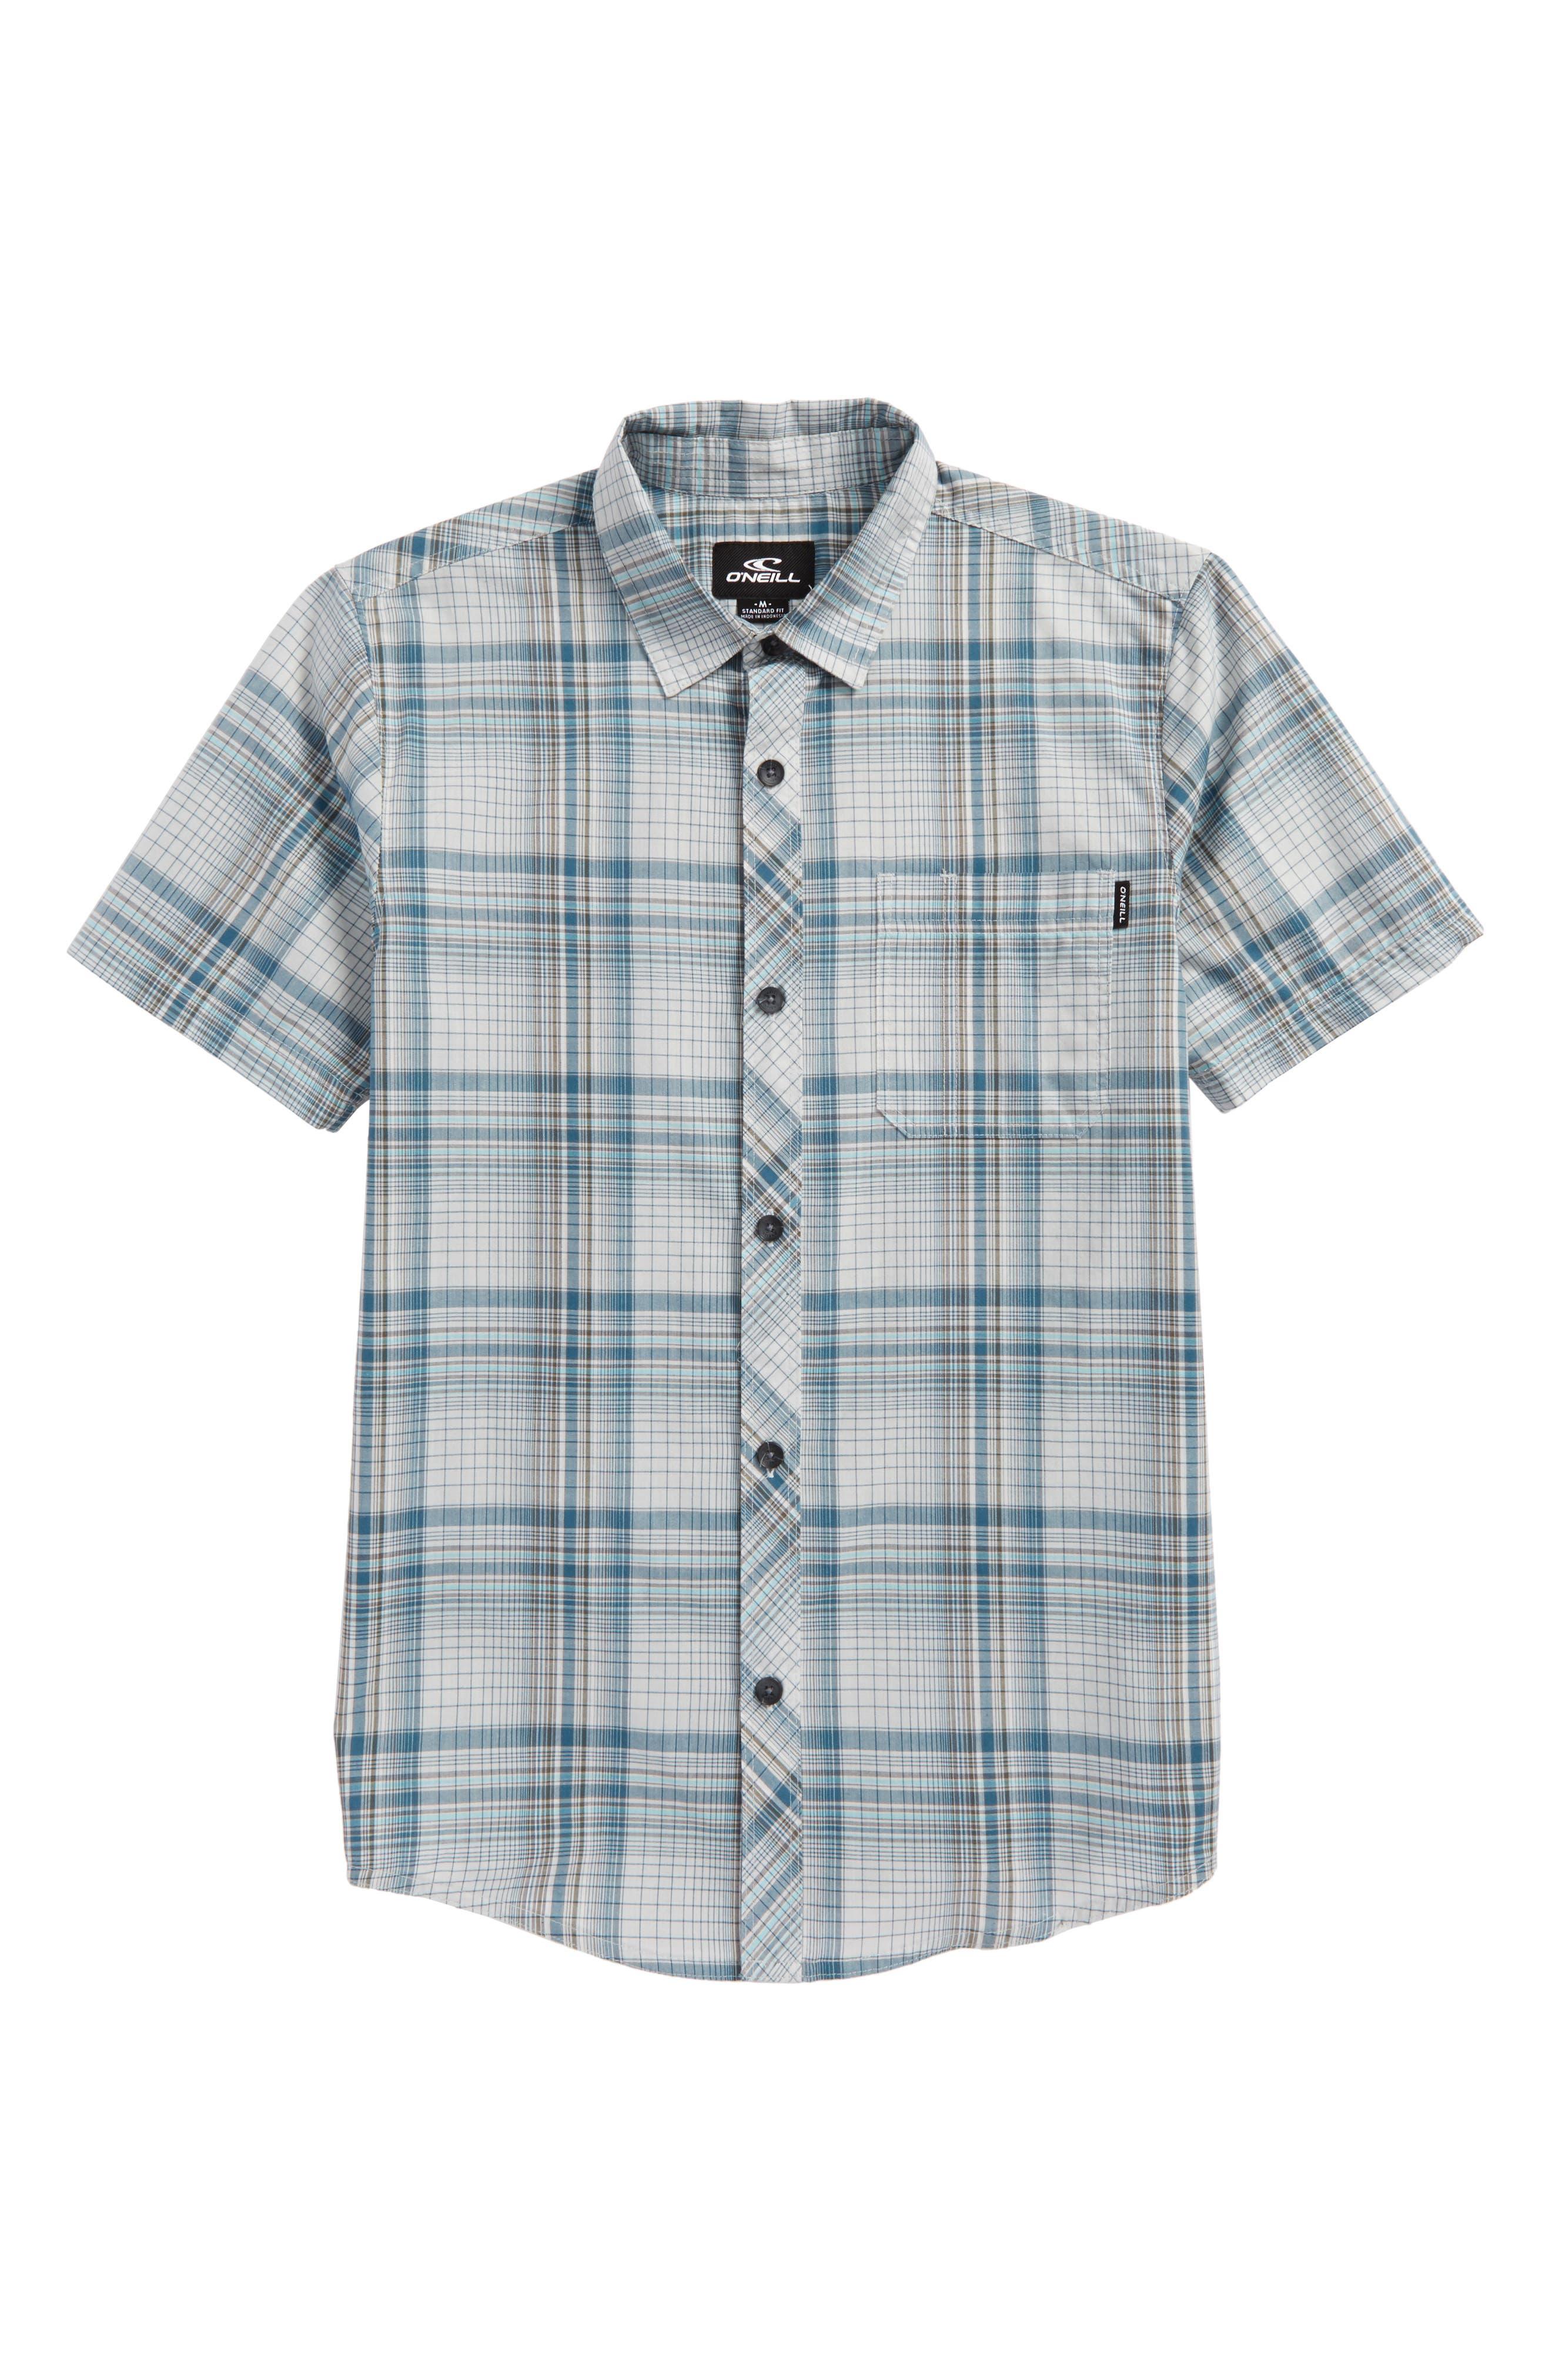 Sturghill Plaid Woven Shirt,                         Main,                         color, Fog